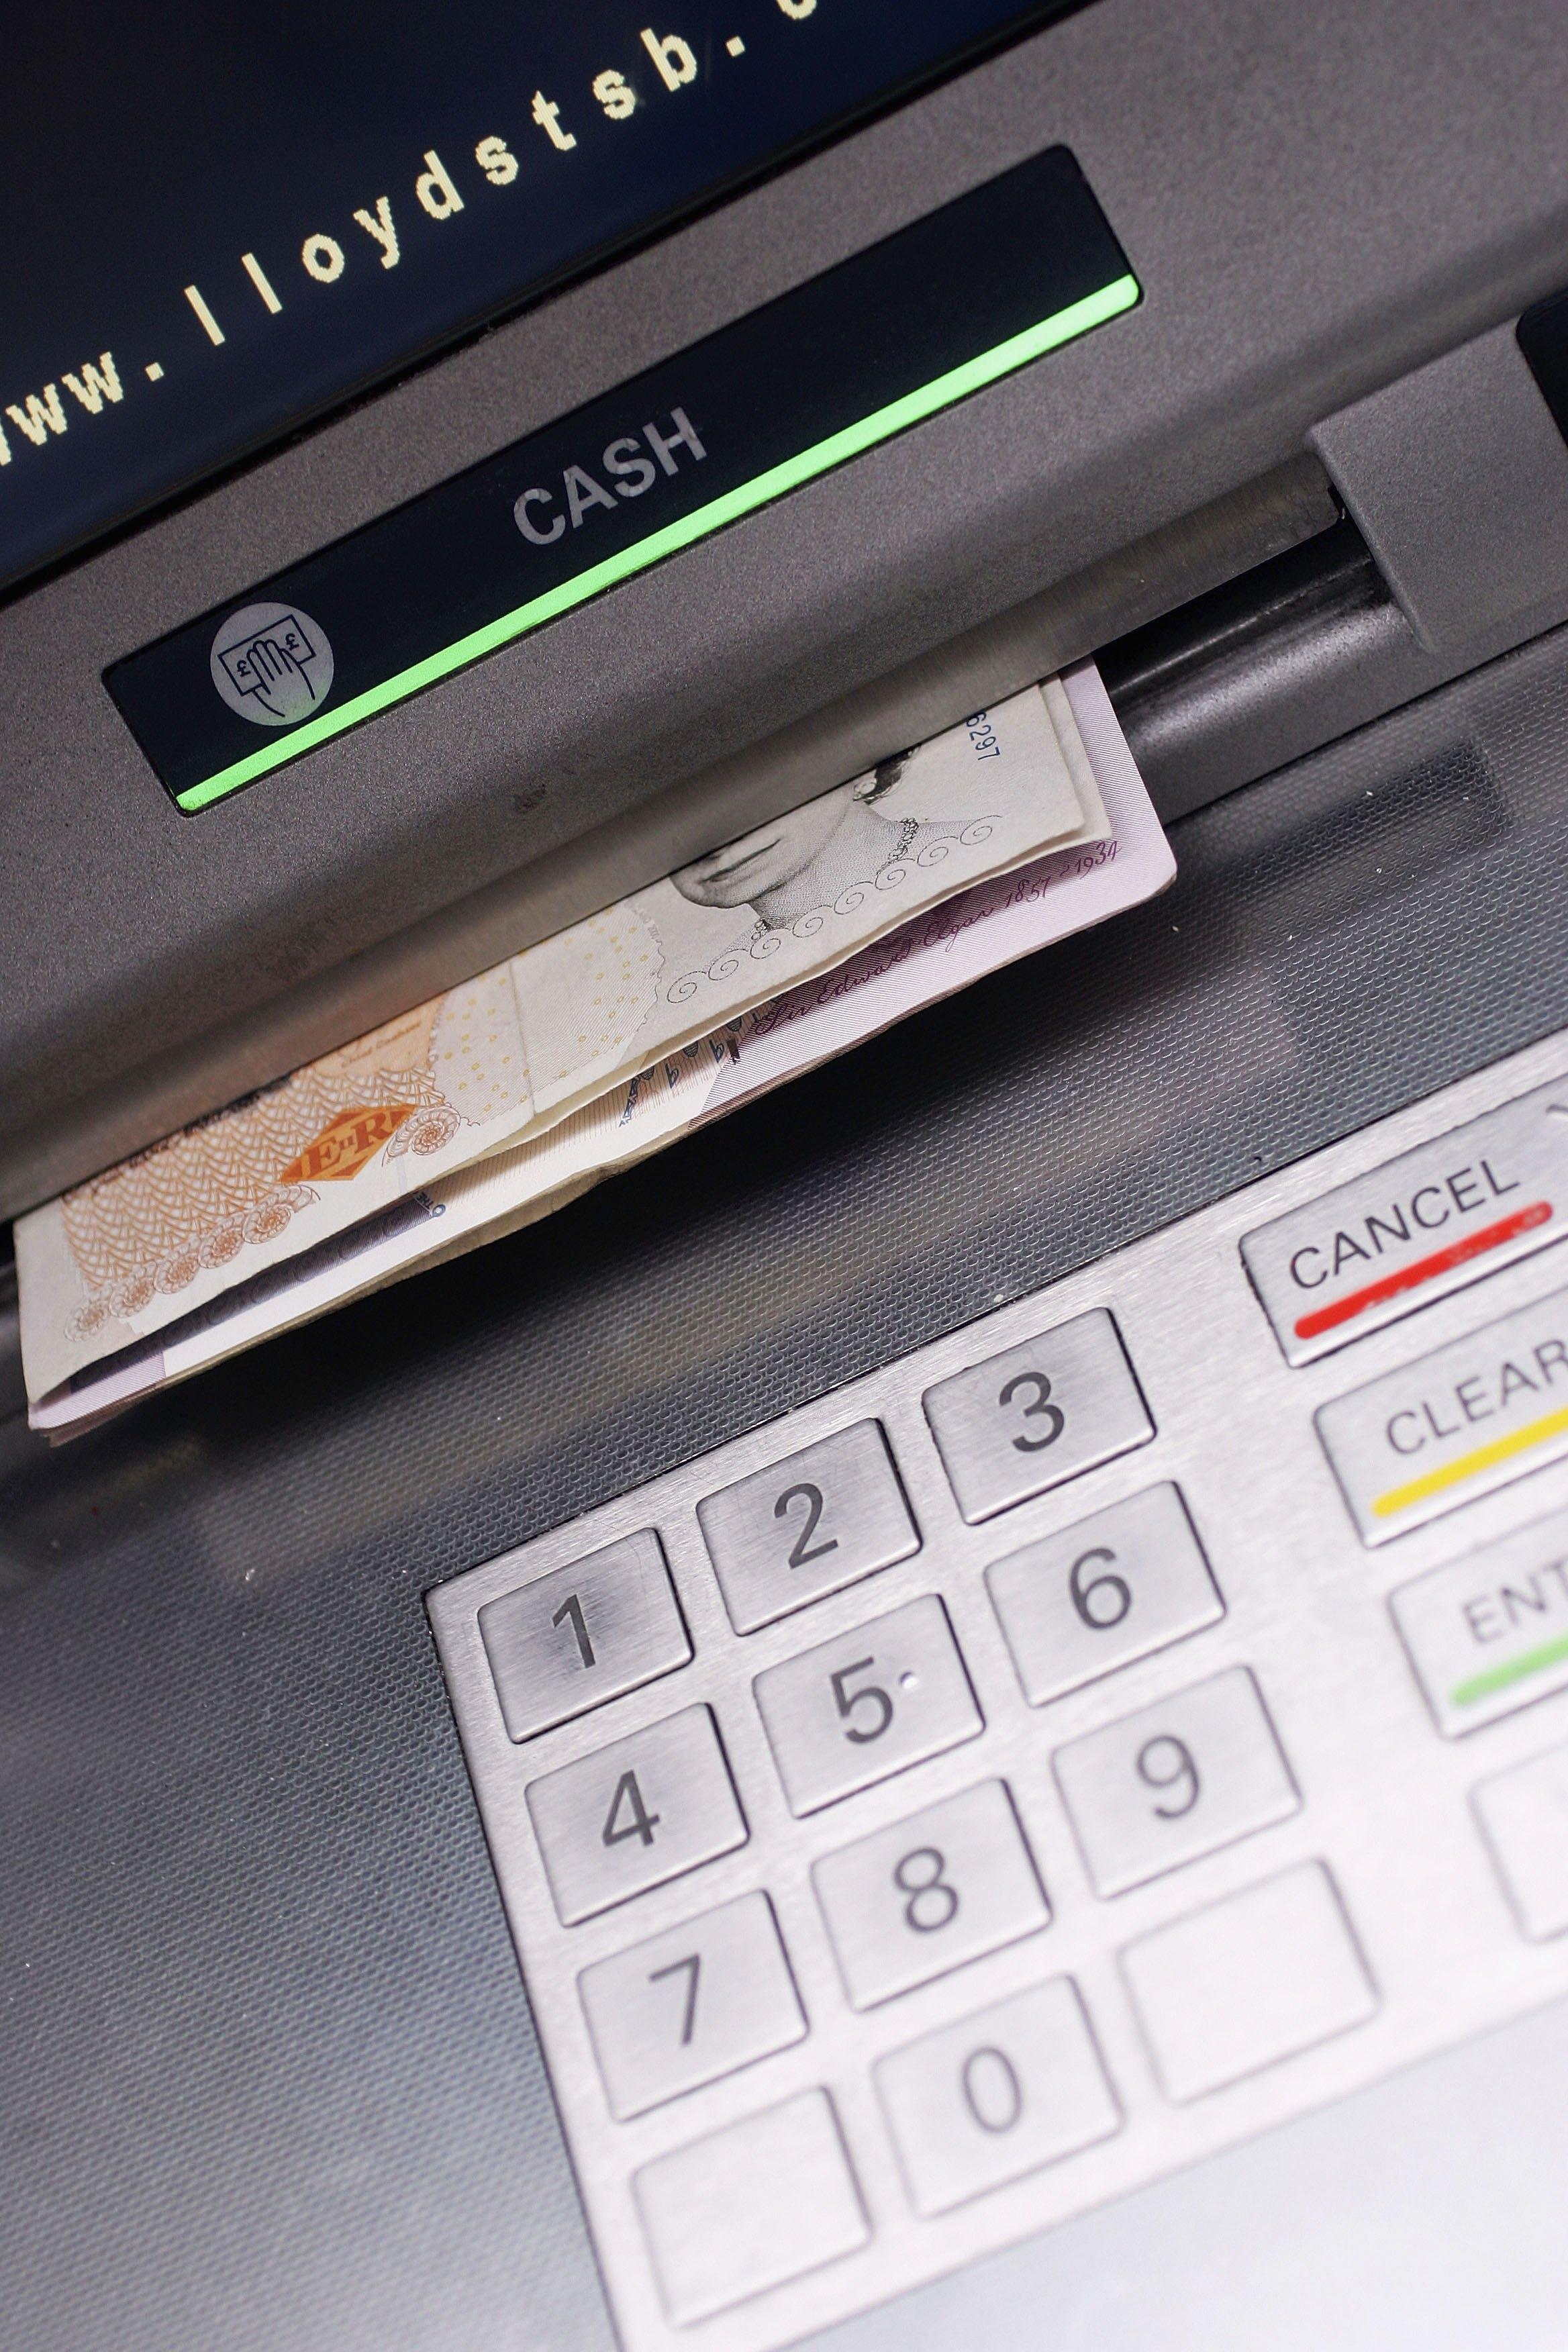 pin machine, ATM